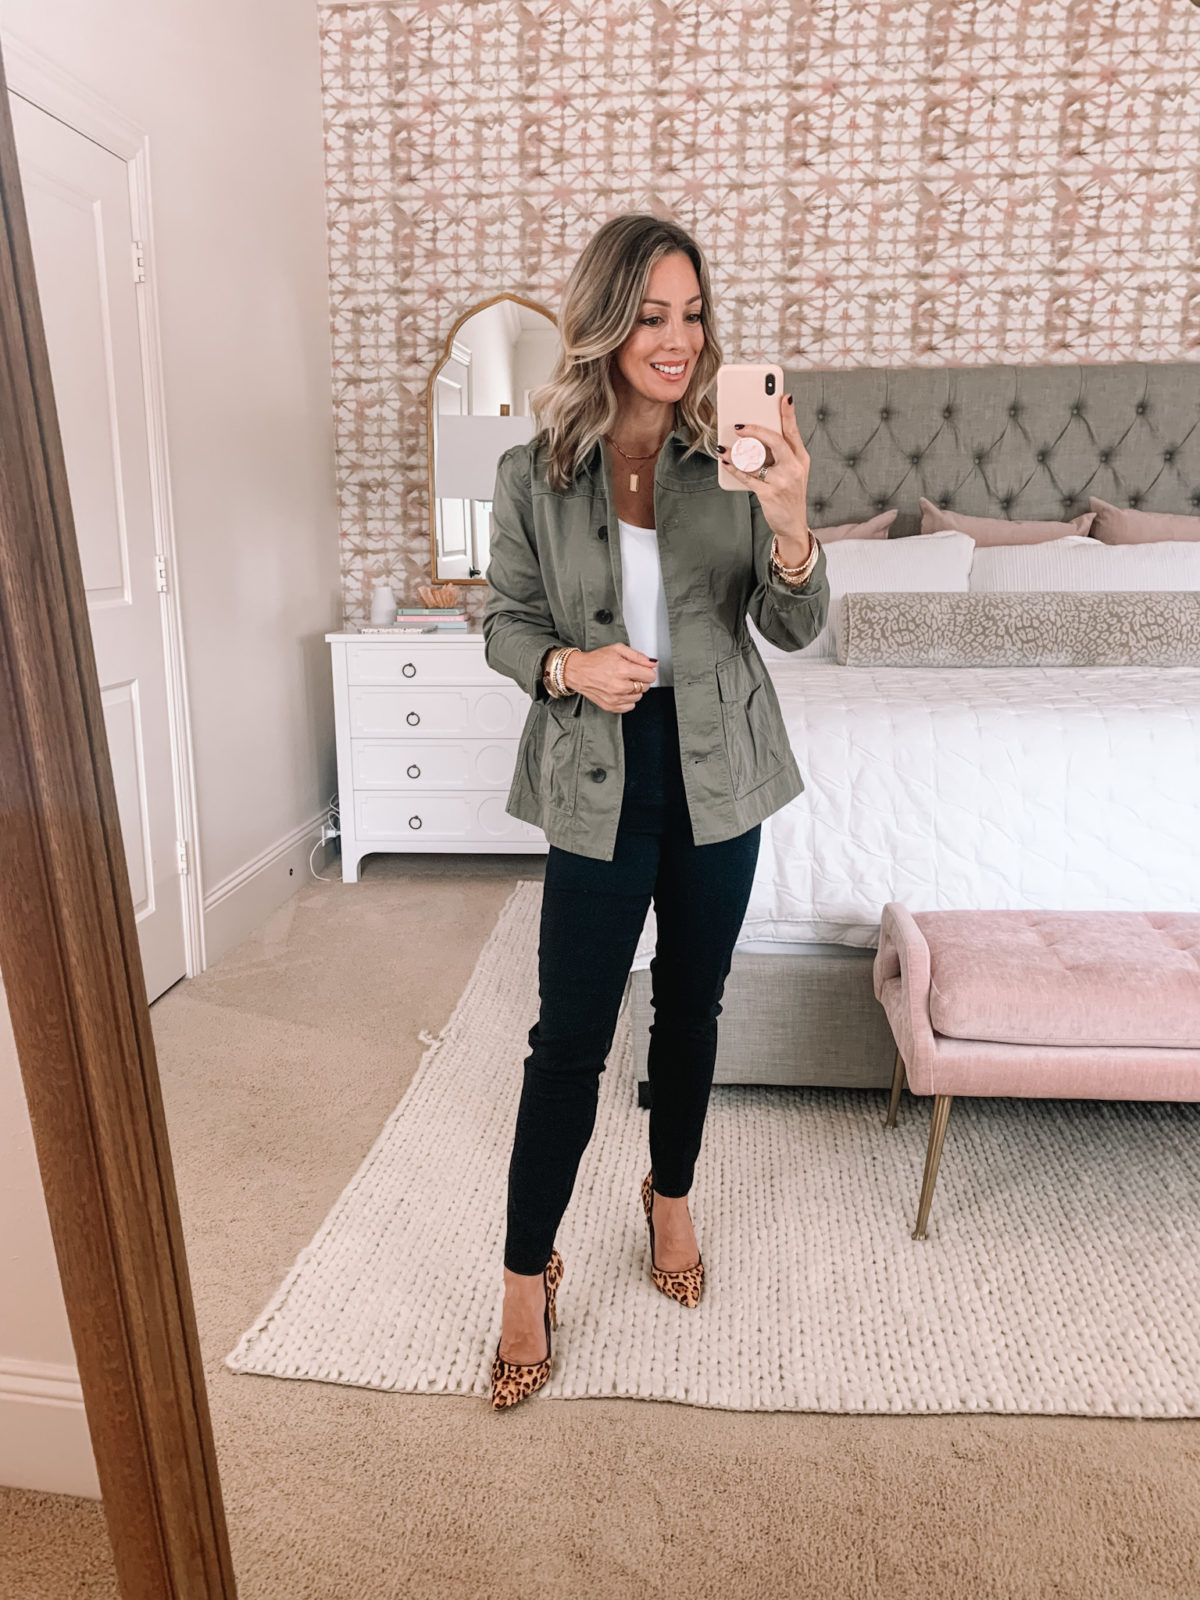 Walmart Fashion, Bodysuit, Utility Jacket, Black Pants, Leopard Heels